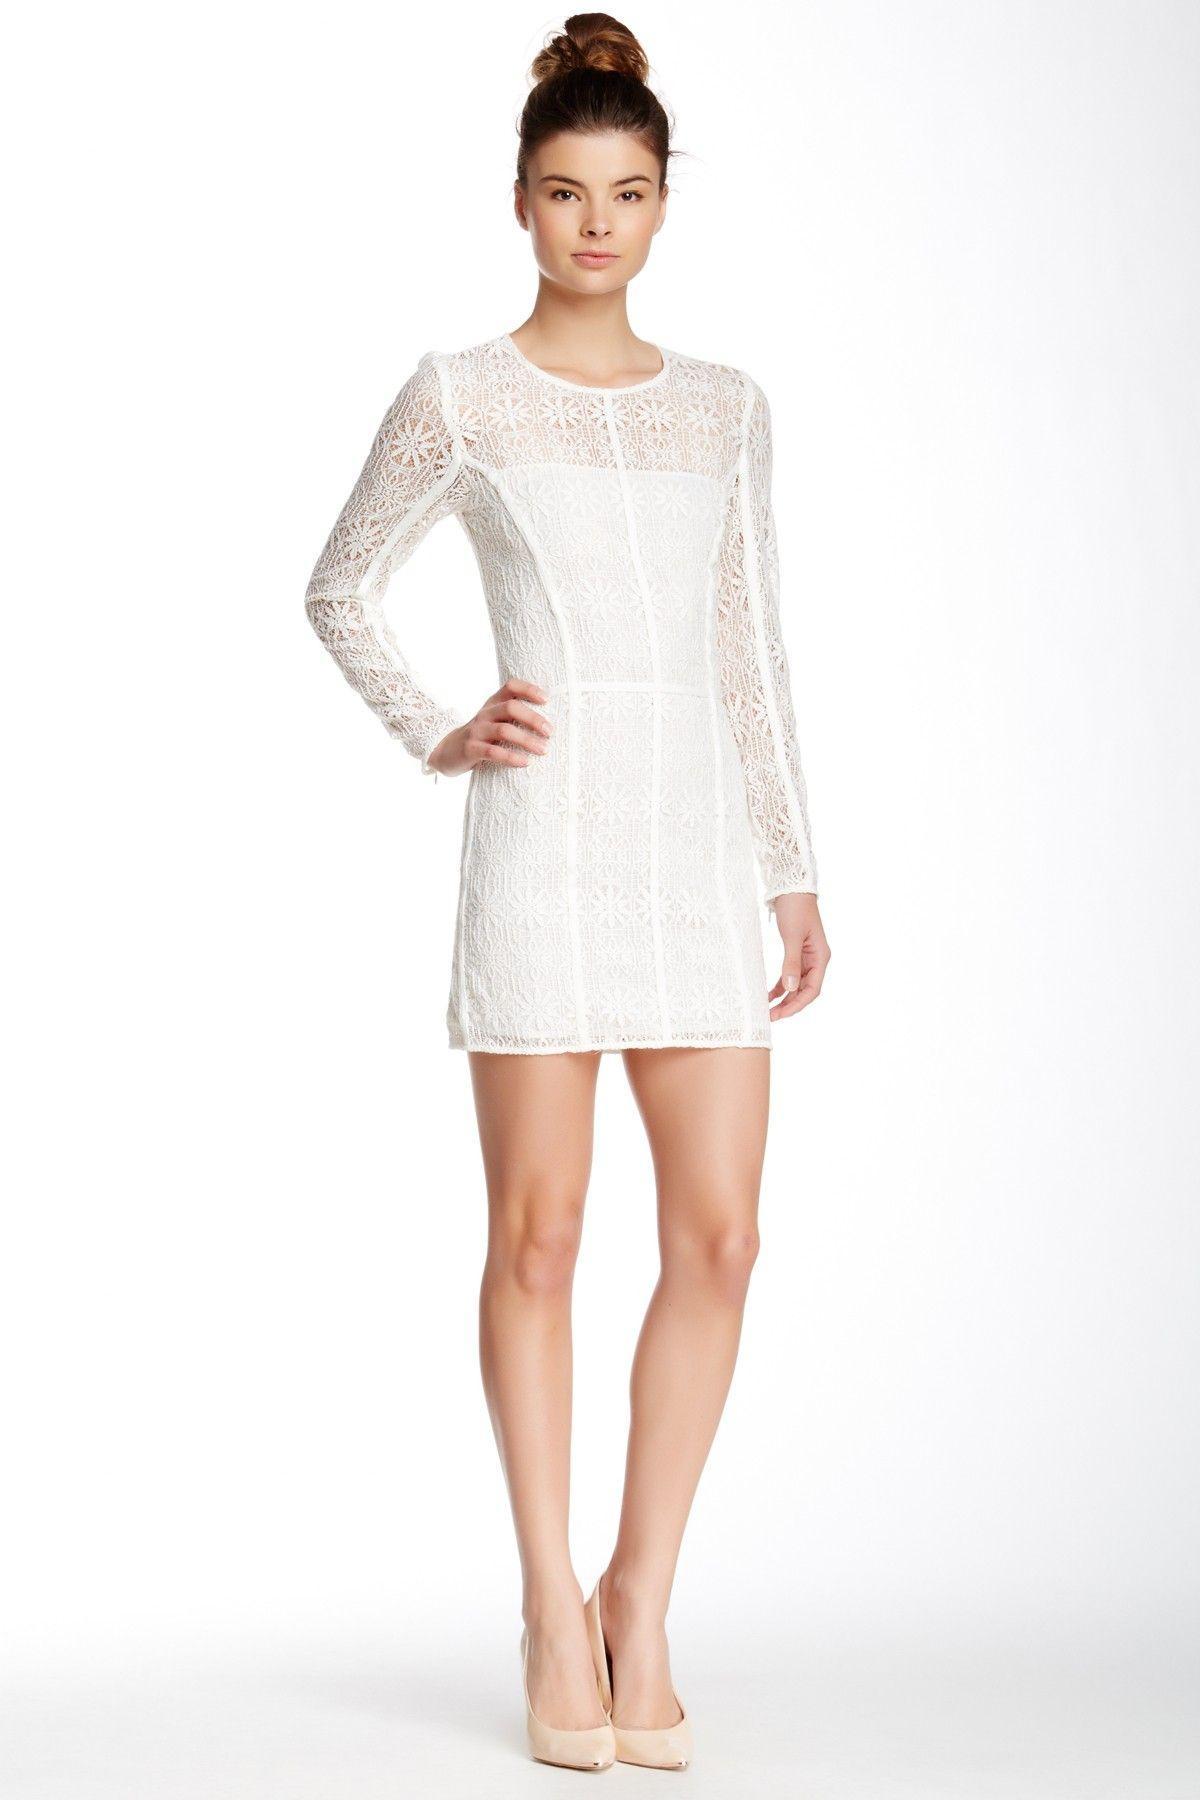 Rachel Zoe Andrea Sheath Dress Nordstrom Rack Dresses Sheath Dress Nordstrom Dresses [ 1800 x 1200 Pixel ]